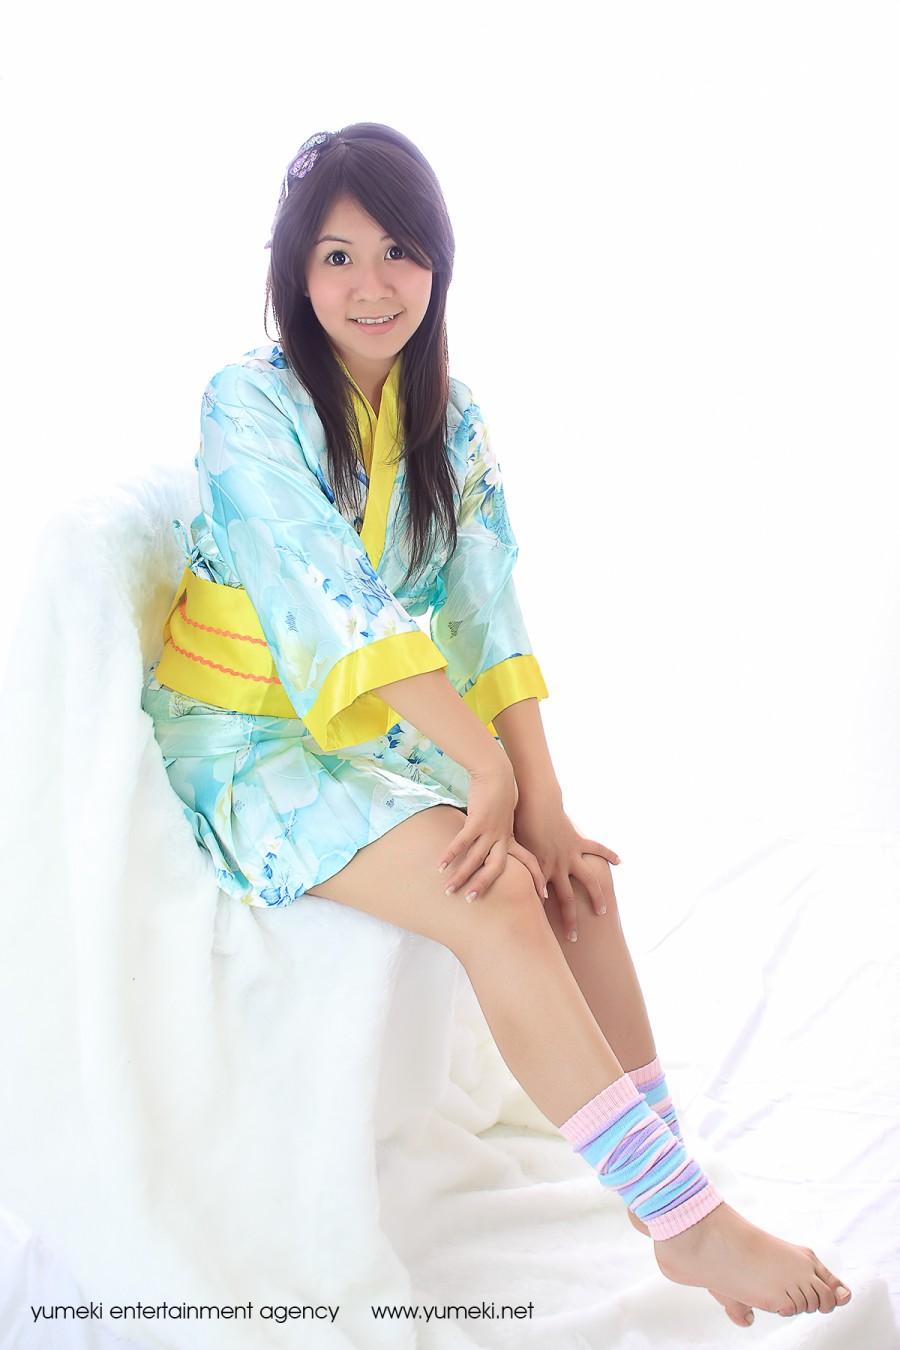 Yumeki Angels (Brisa II) – Septiembre 2012